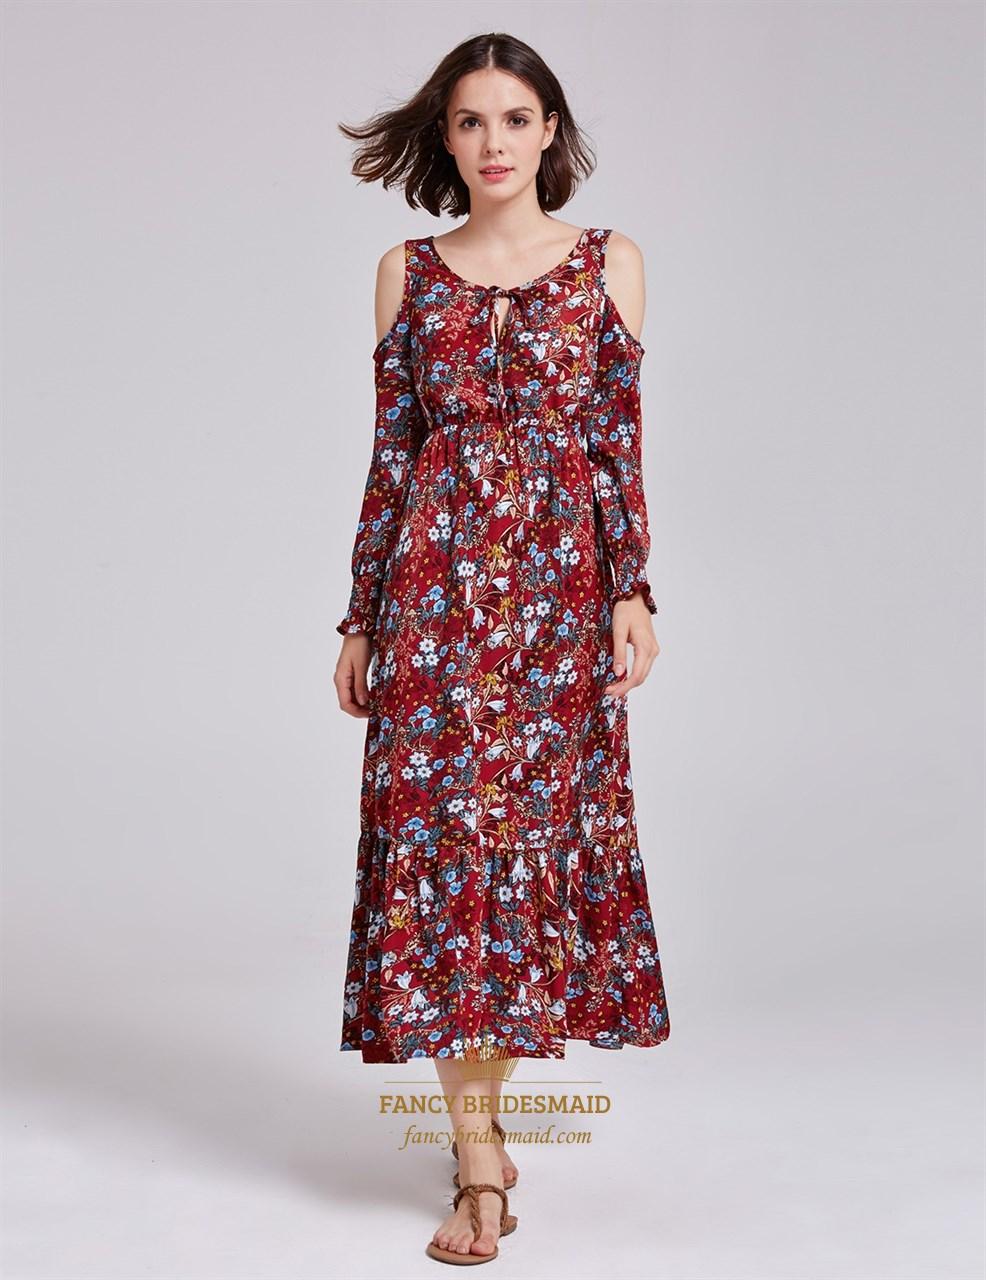 Tea Length Scoop Neckline A-Line Floral Print Dress With